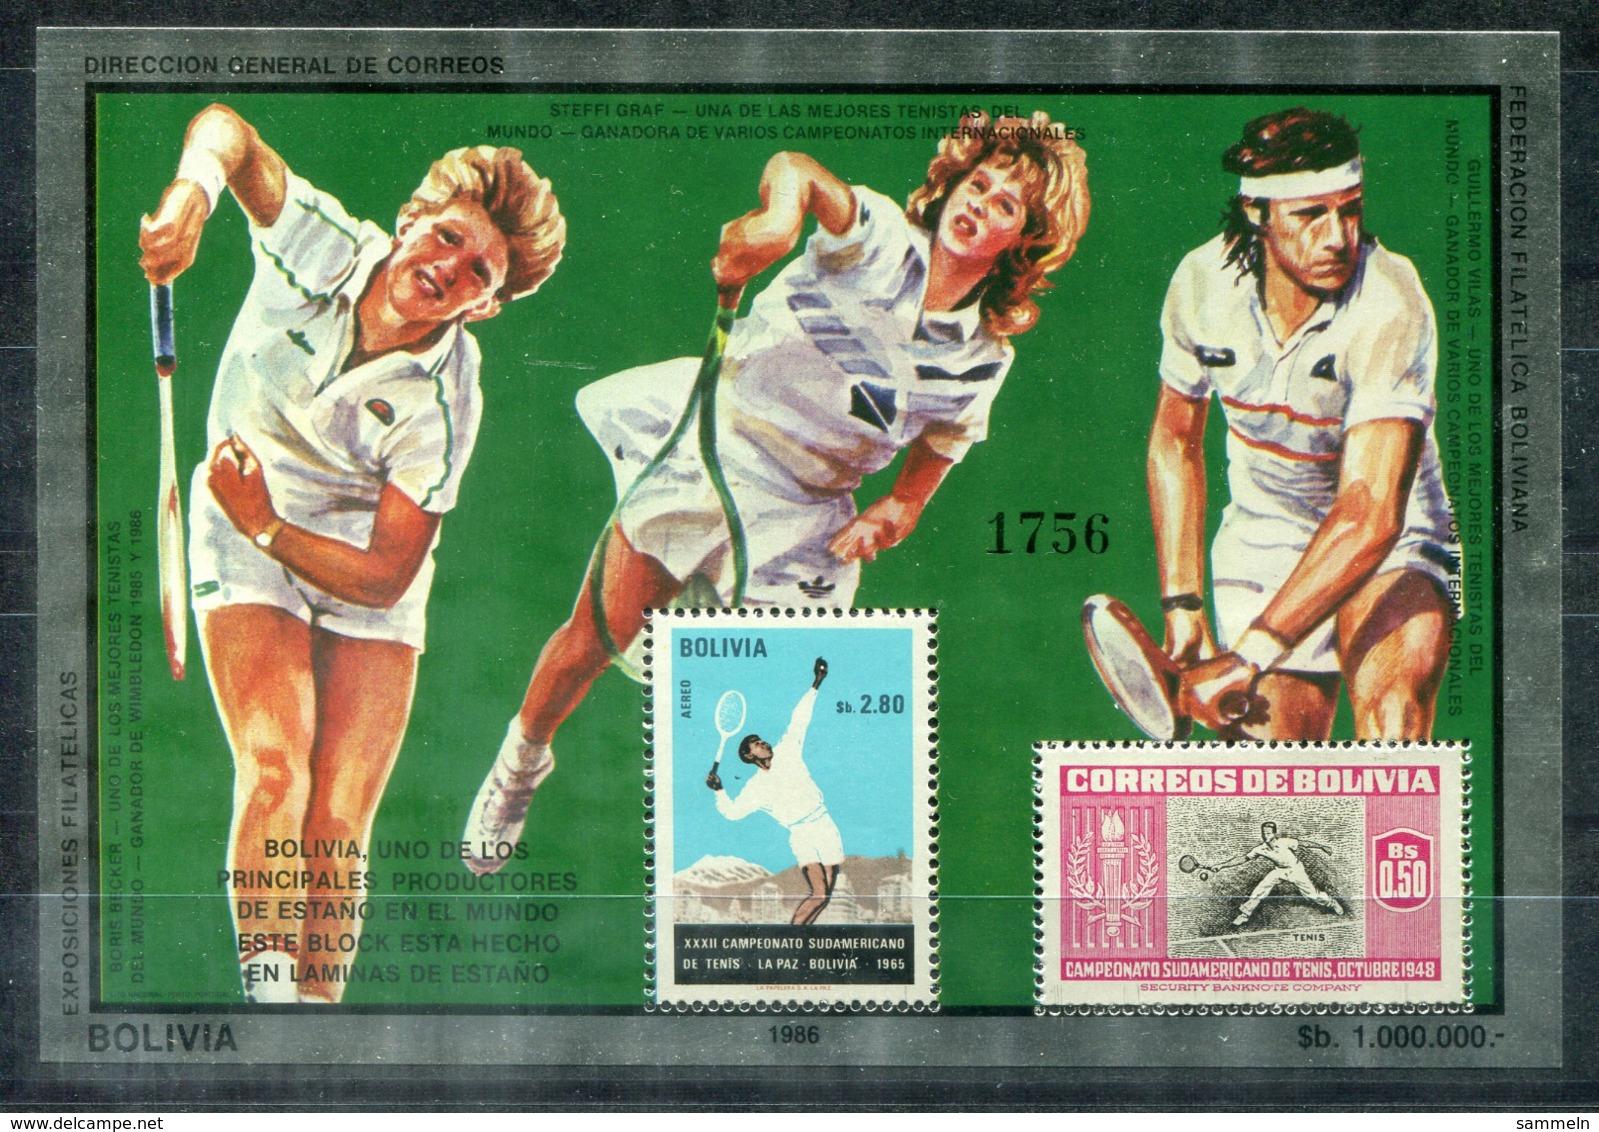 5076 - BOLIVIEN - Metall-Block 159 ** - TENNIS / BORIS BECKER / STEFFI GRAF / GUILLERMO VILAS - Bolivien